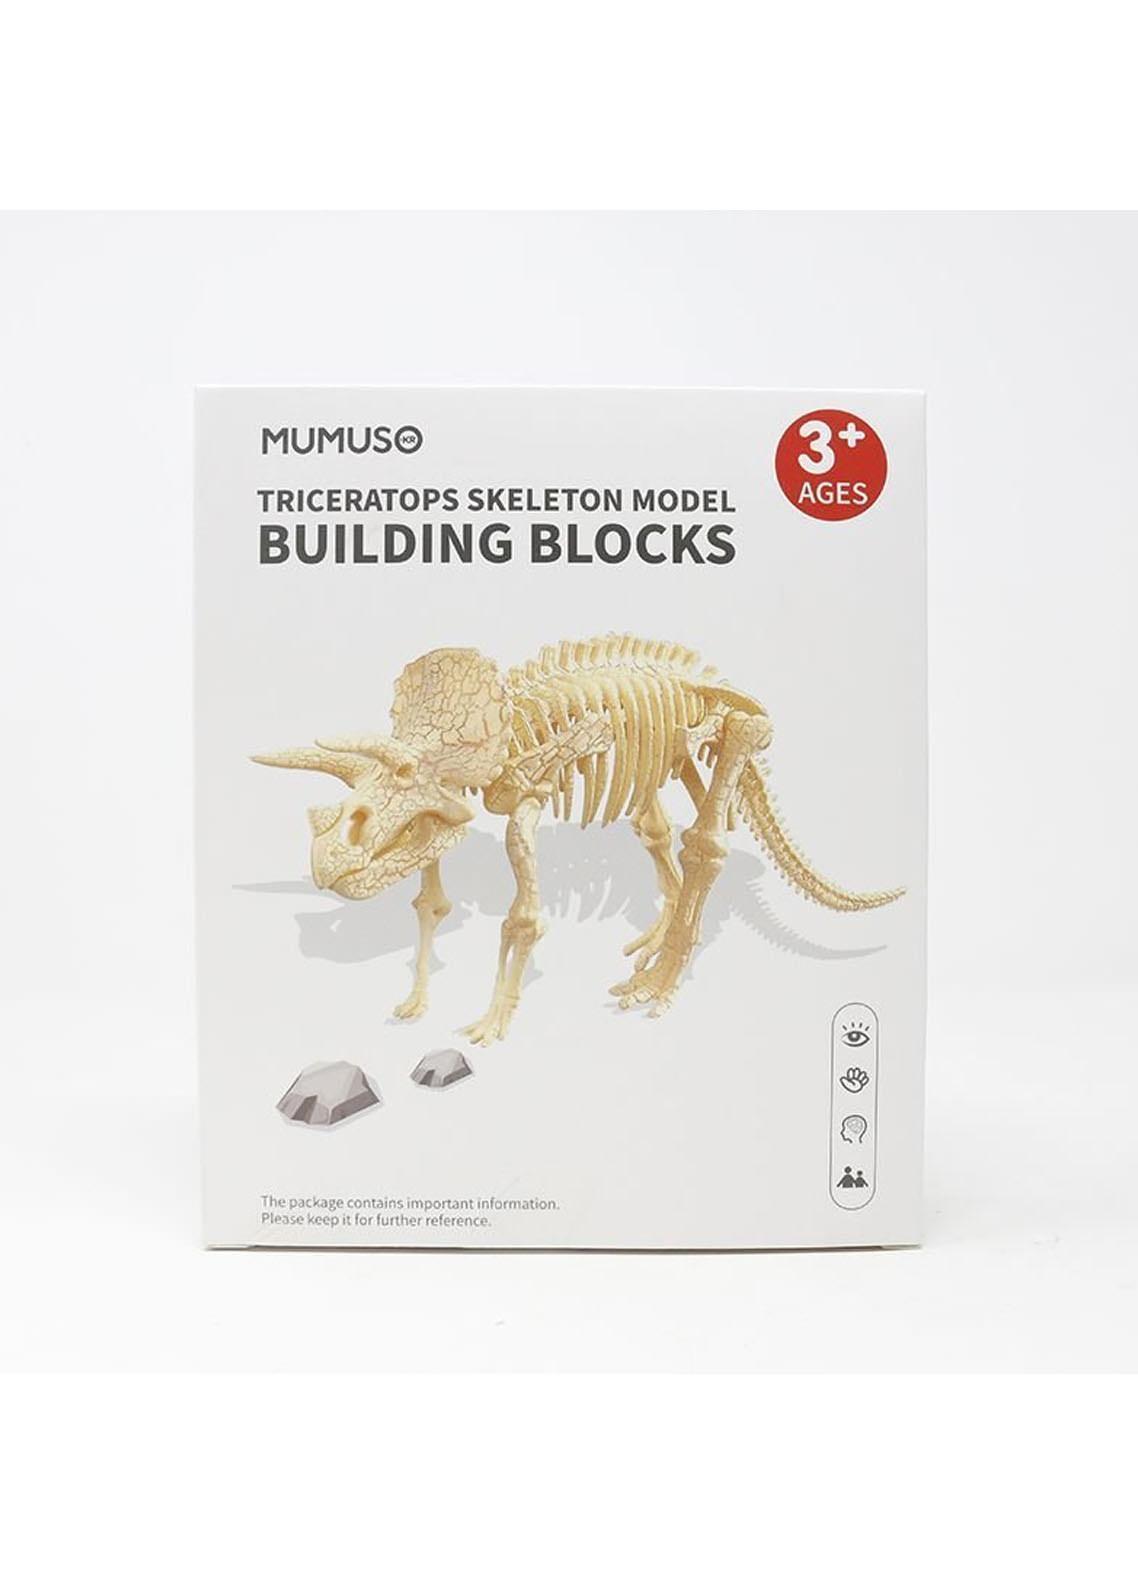 Mumuso TRICERATOPS SKELETON MODEL BUILDING BLOCKS